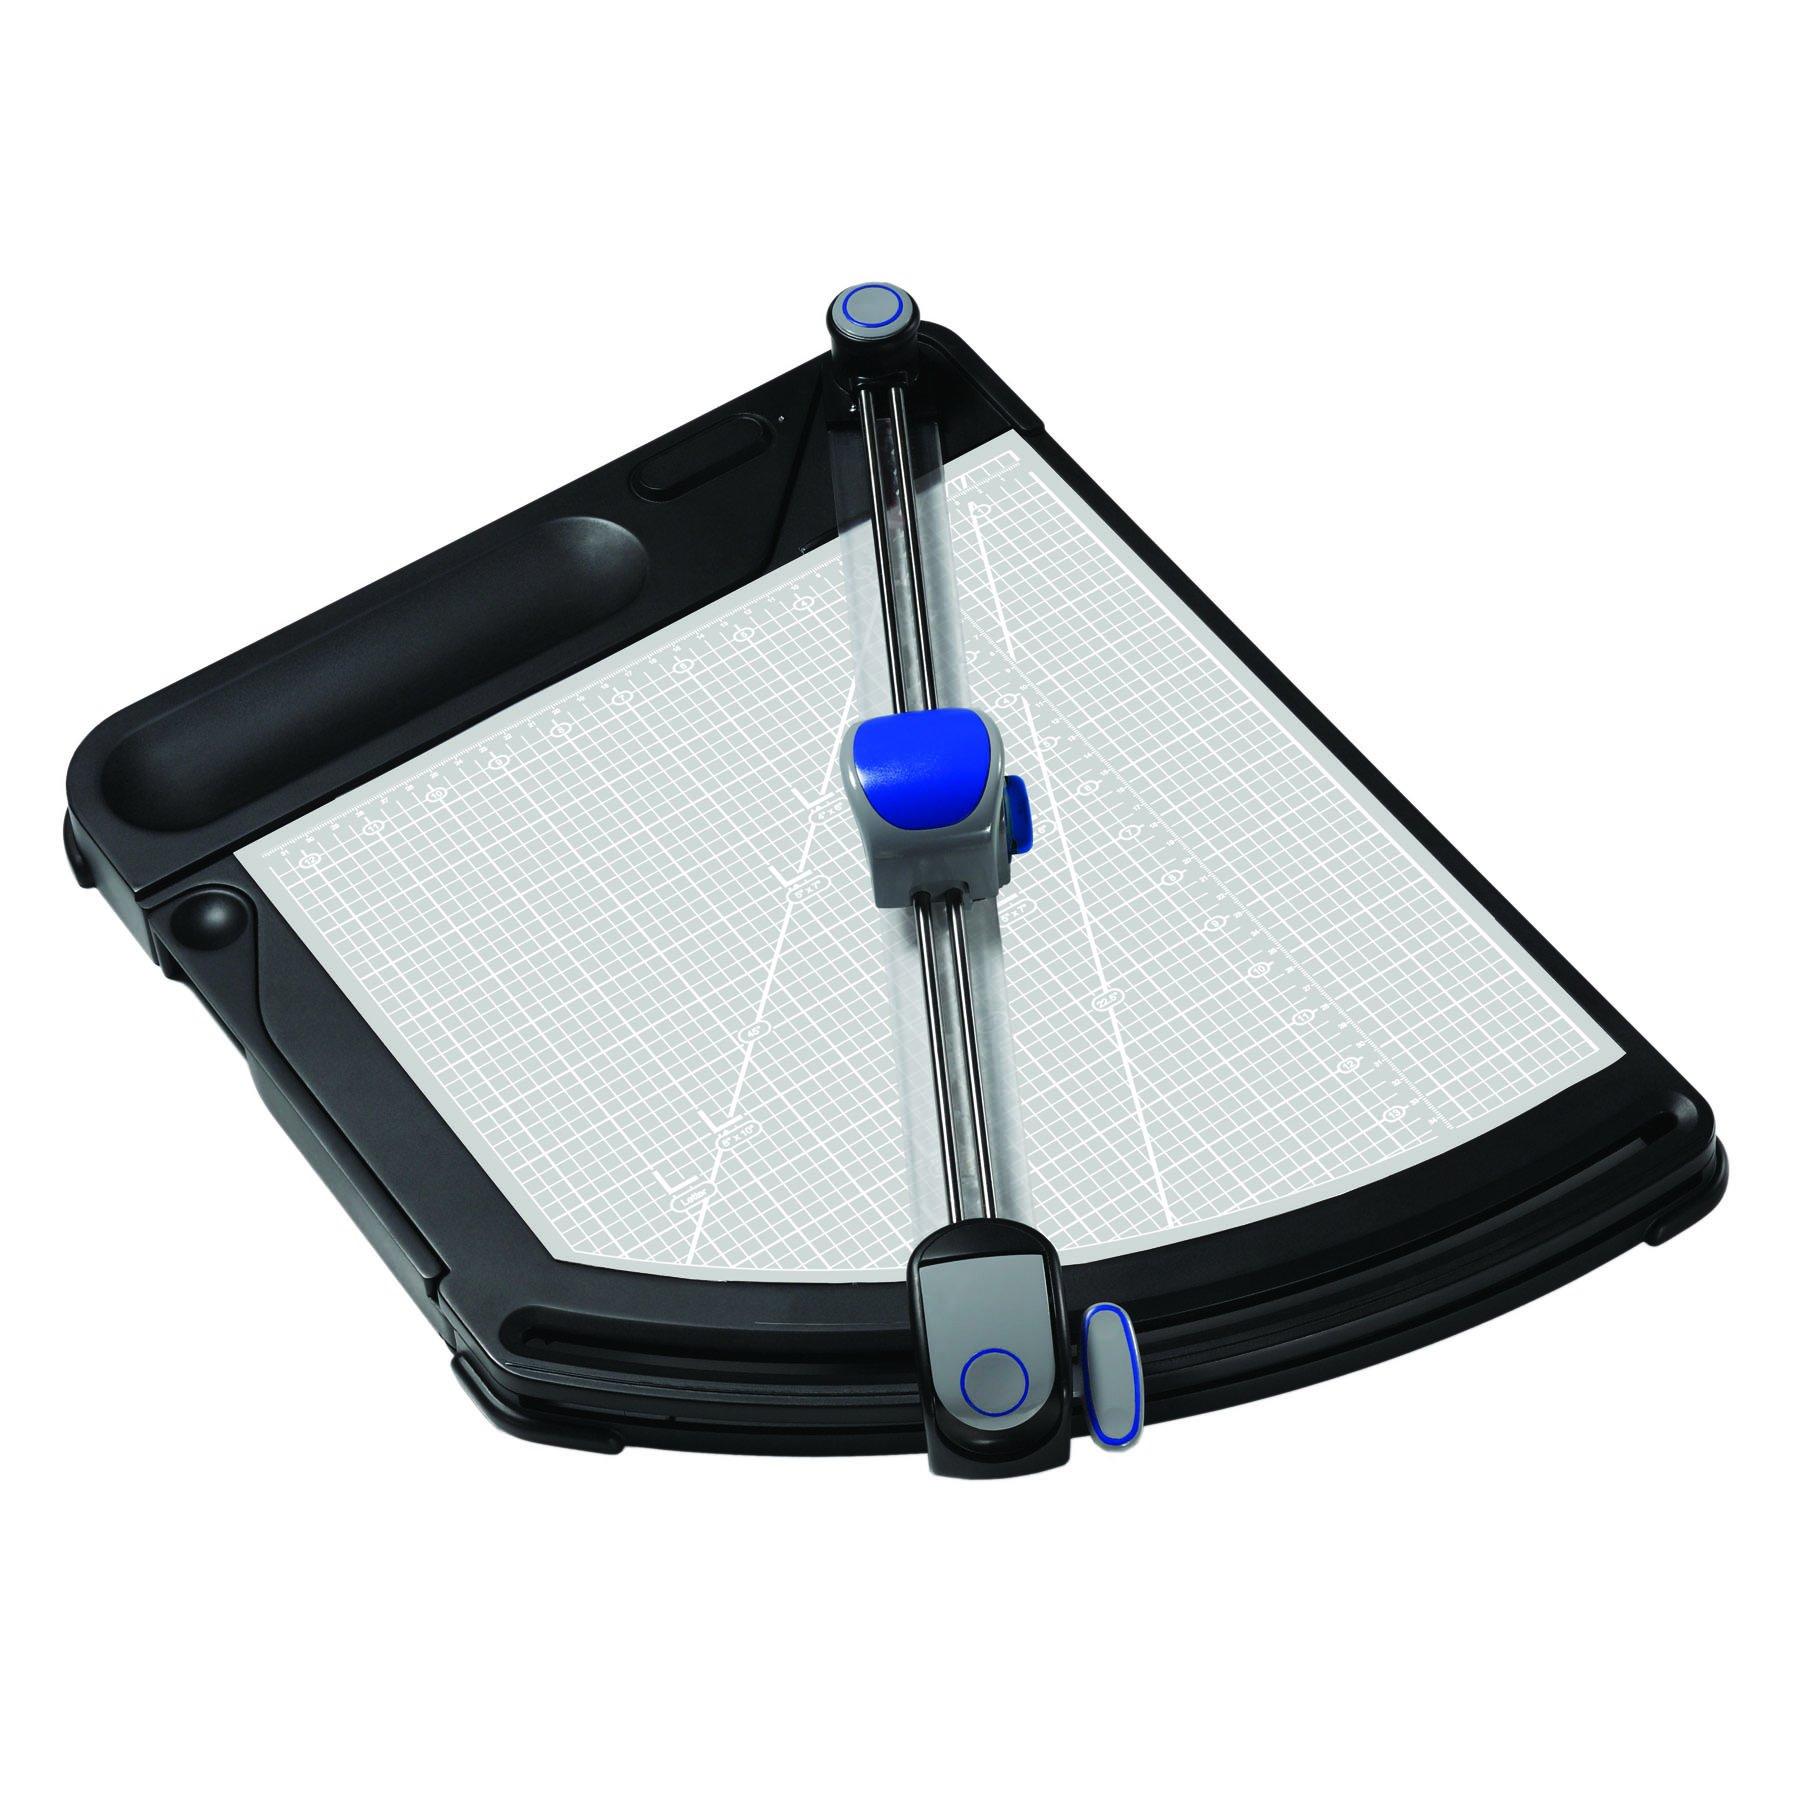 X-ACTO PivotCut Innovative Trimmer, Precision Cut, Rotary Trimmer, Black (26205)